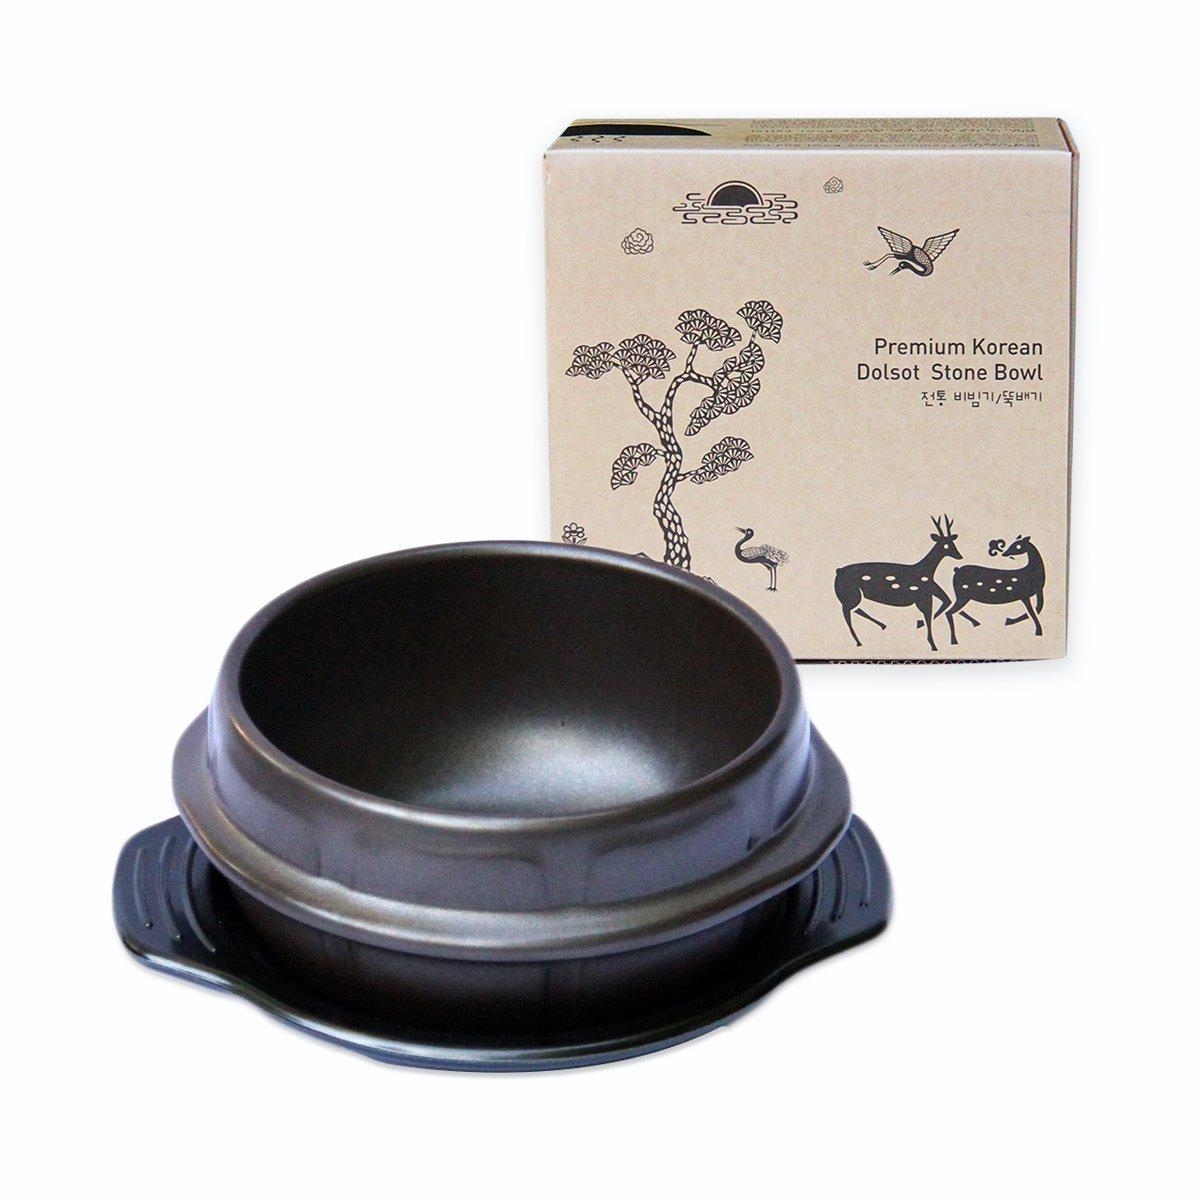 "Sizzling Plate for Steak, Fajita, Bulgogi, Galbi, Korean BBQ Sizzler - Premium Ceramic (8"", Dia. Small)"